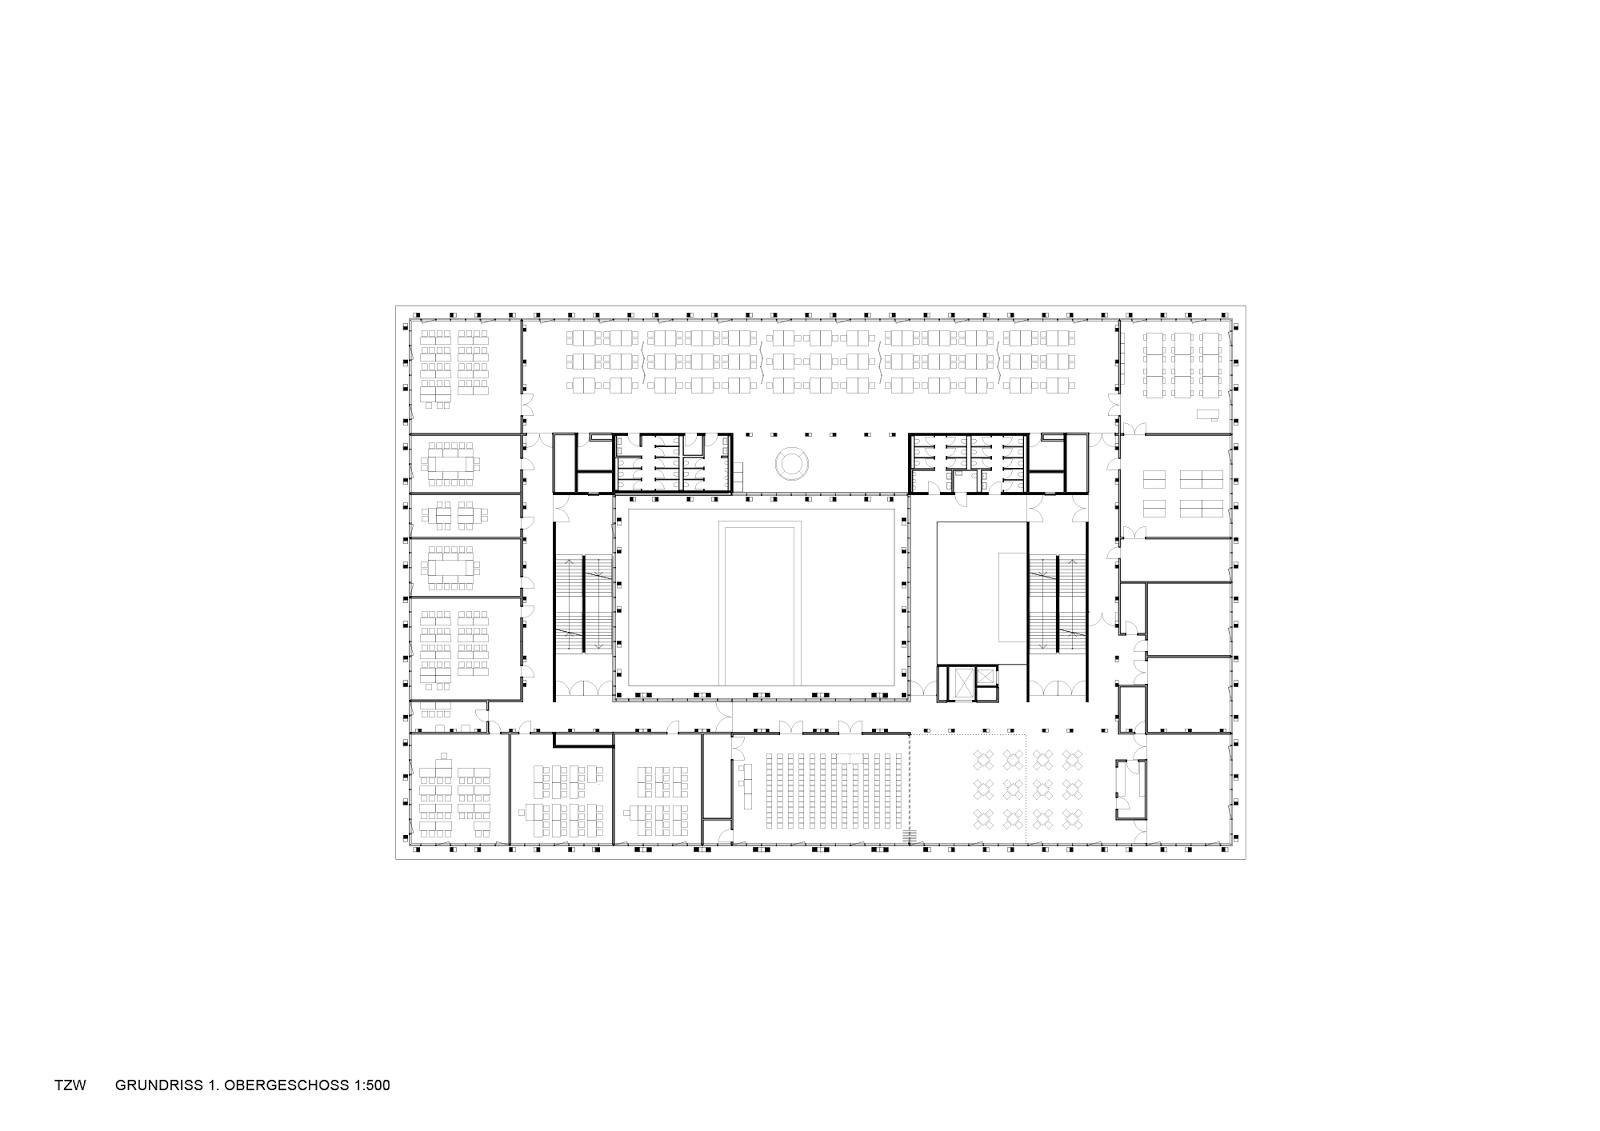 Alleswirdgut architektur a f a s i a for Architectural concepts types